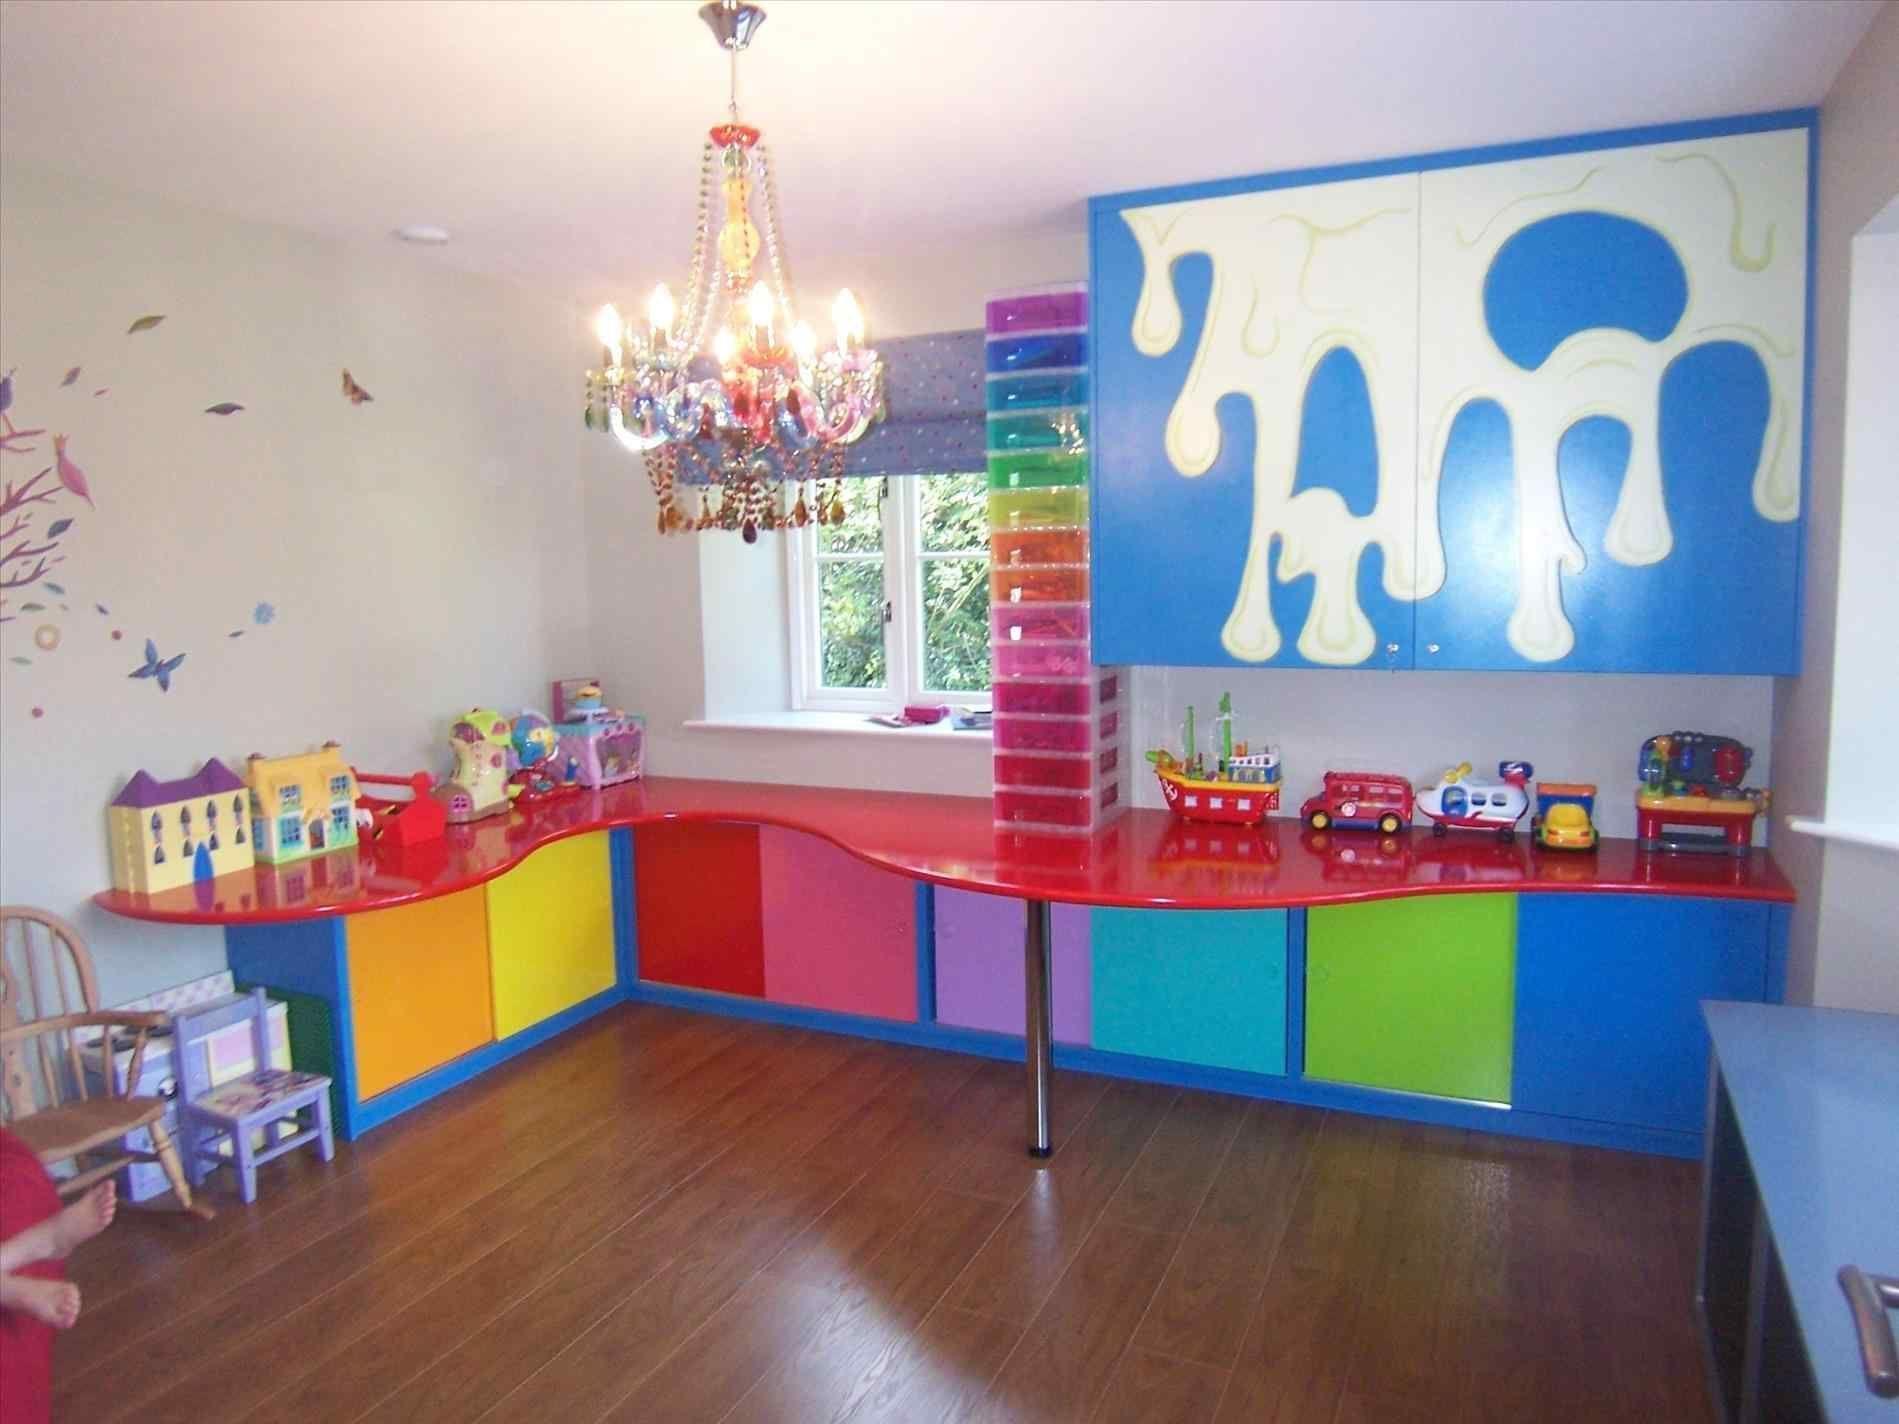 Diy Toy Organizer Storage Ideas Perfect For Small Es And Kids Inspiration Toyorganizer Toystorage Kidsfun